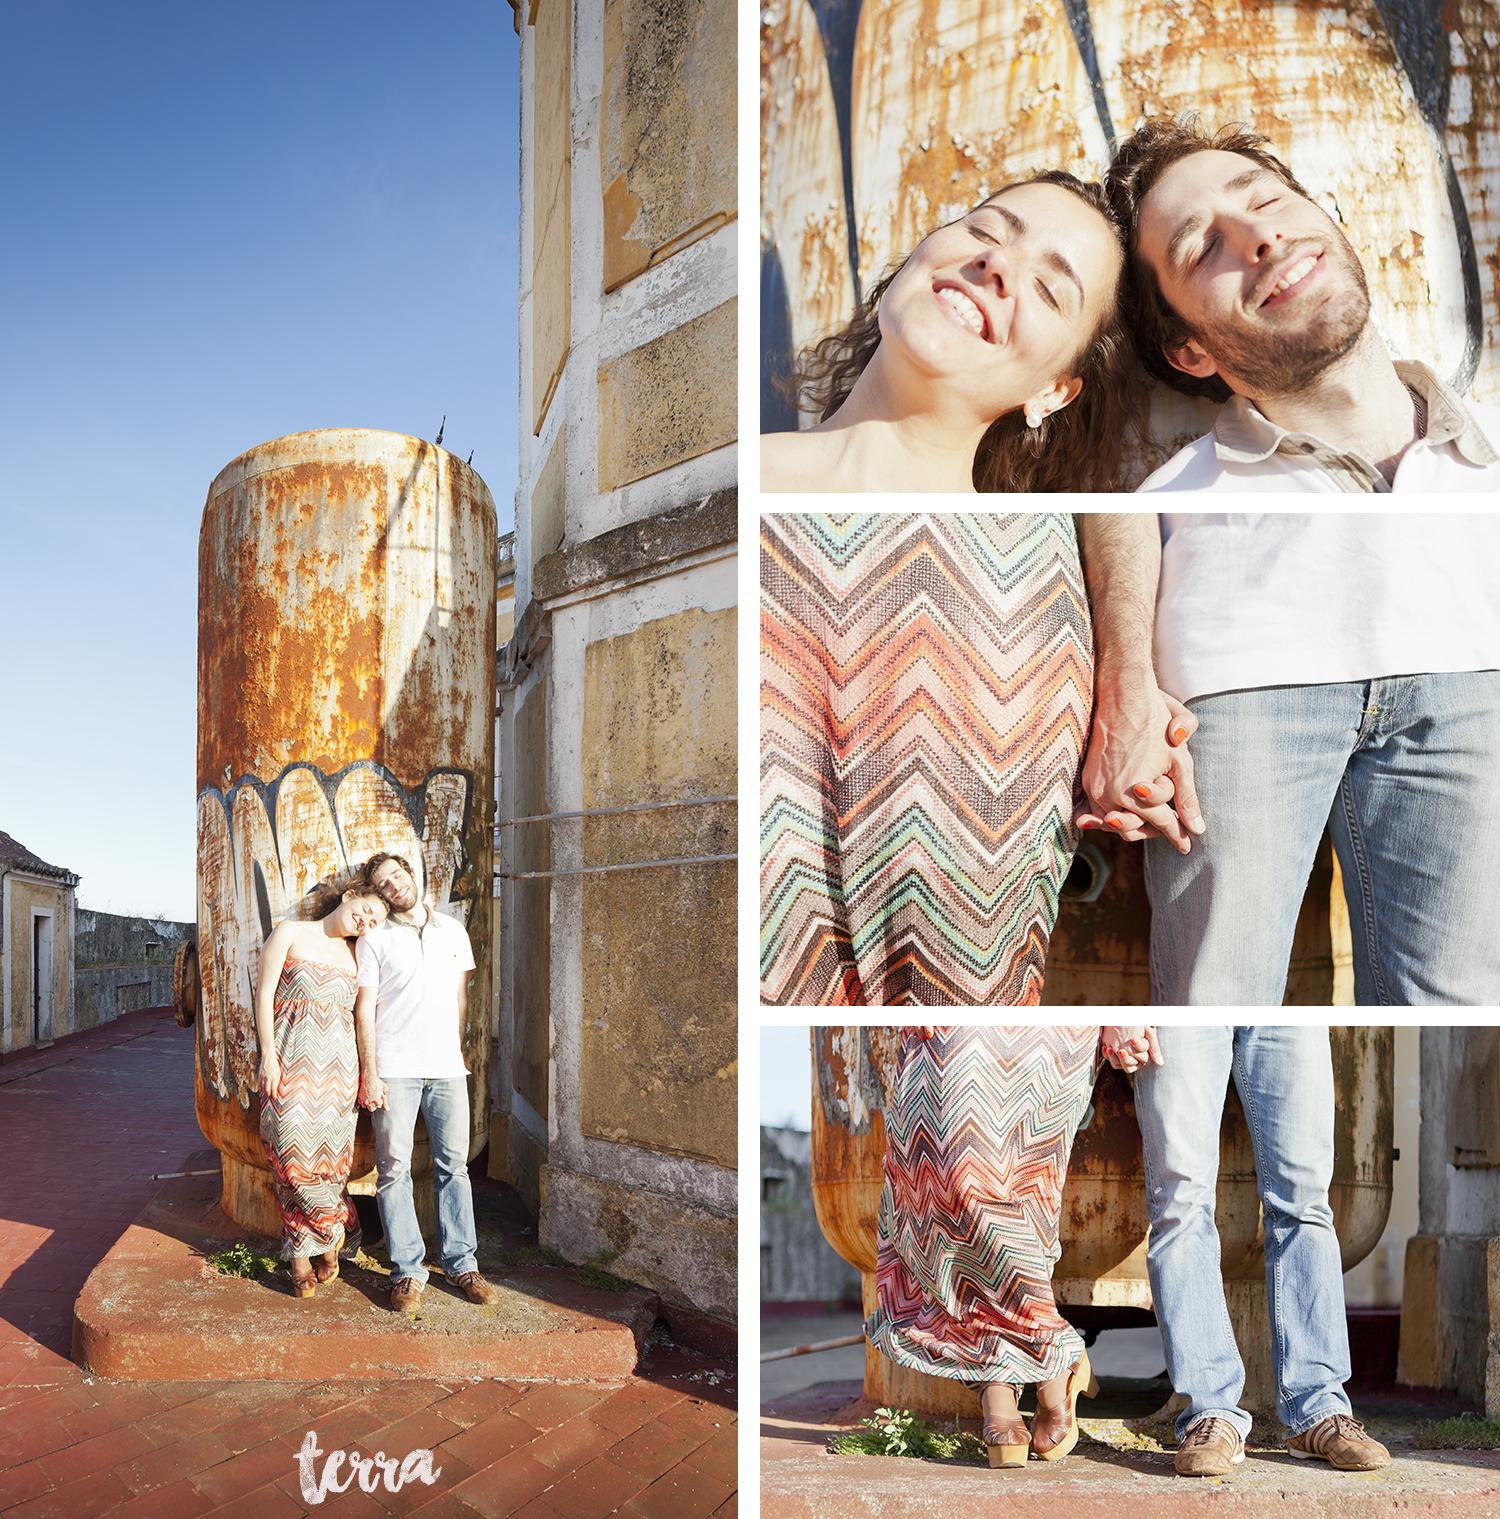 sessao-fotografica-casal-forte-nossa-senhora-graca-elvas-terra-fotografia-0040.jpg